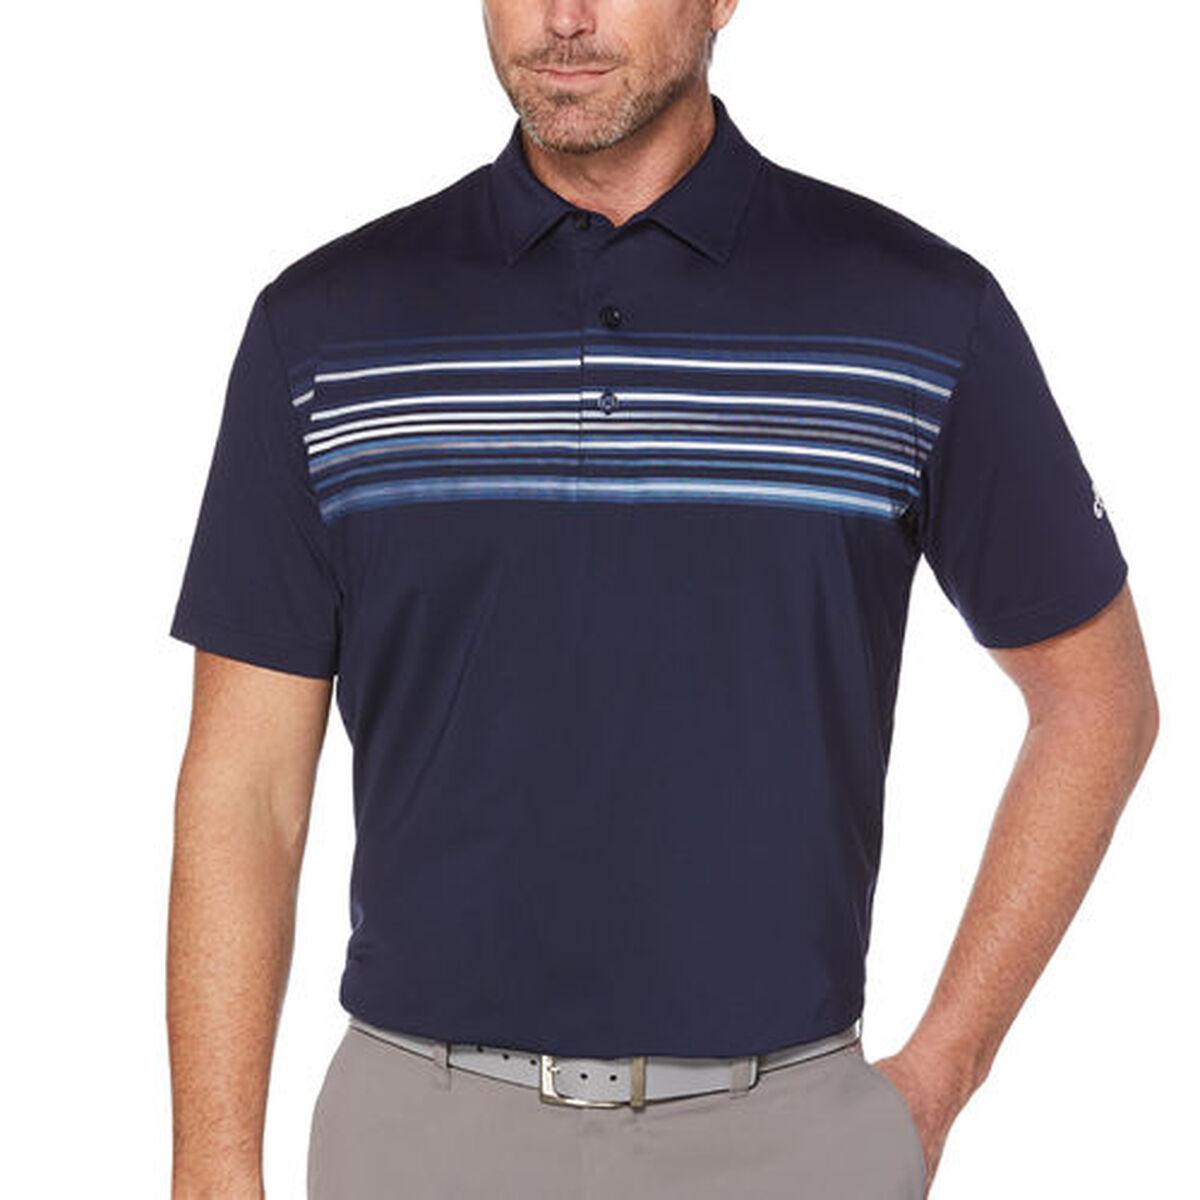 b1d656fe6 Callaway Men's Opti-Dri Chest Pigment Print Short Sleeve Polo Zoom Image